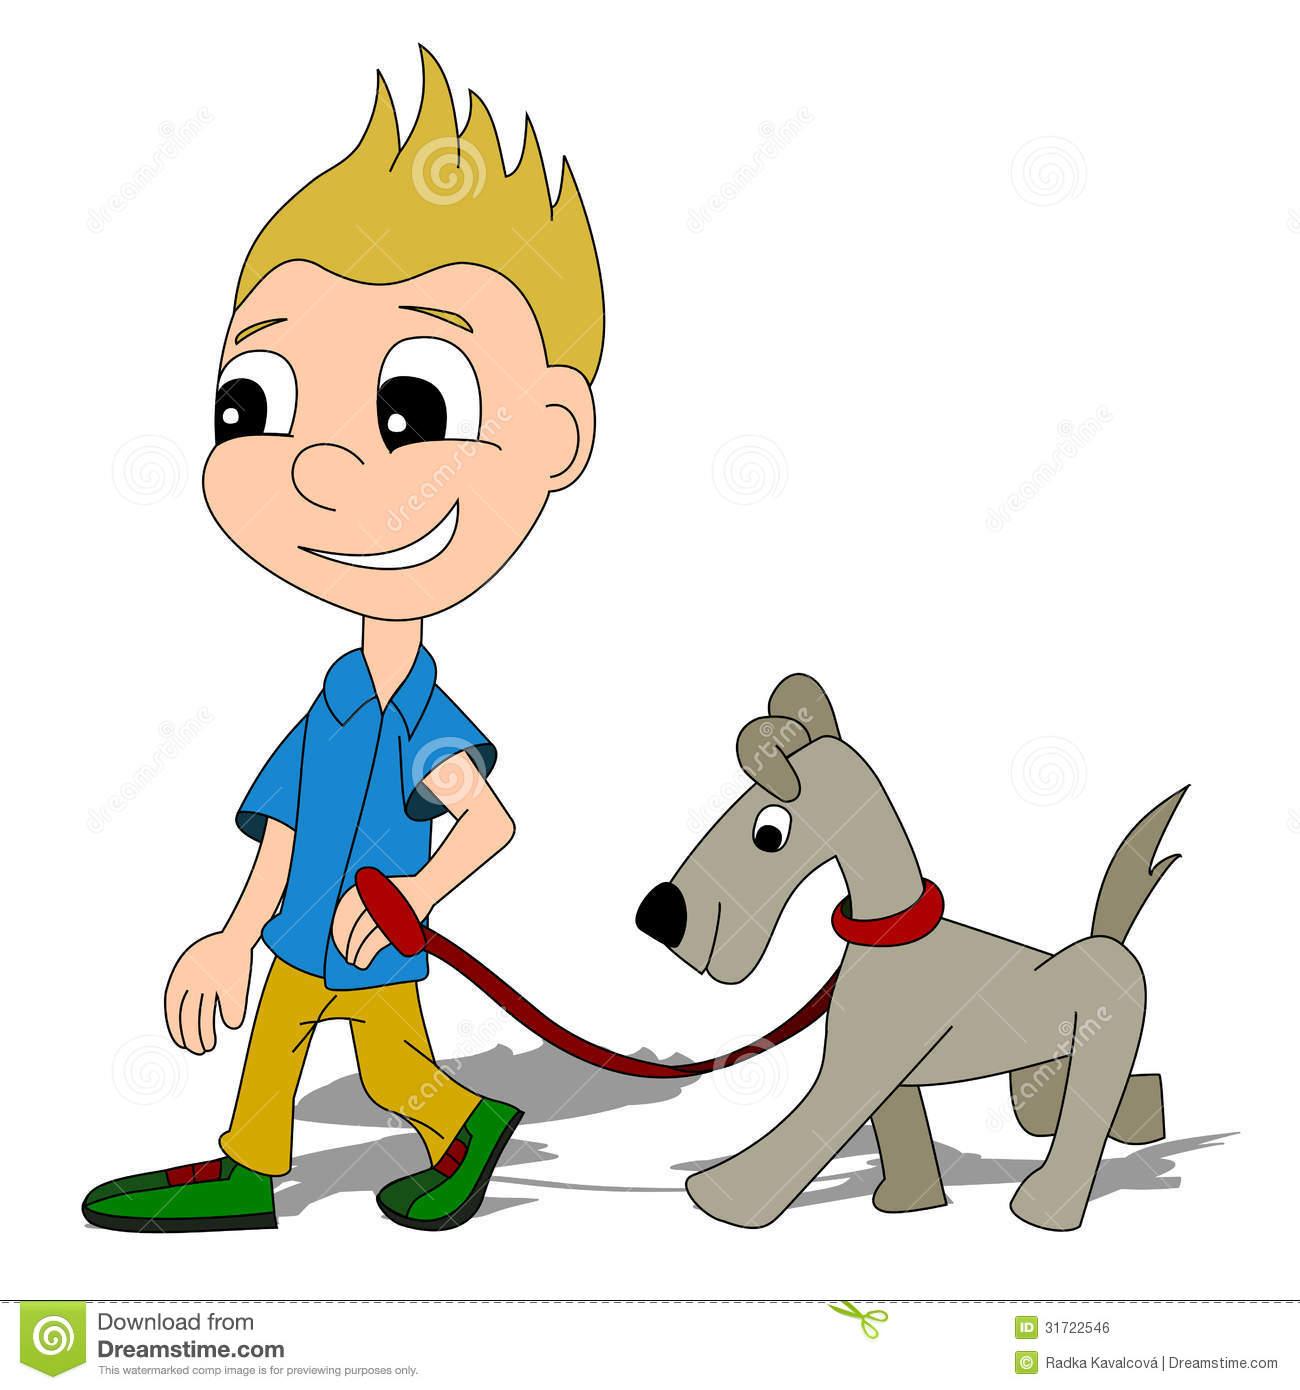 jpg download Free cartoon download clip. Girl walking dog clipart